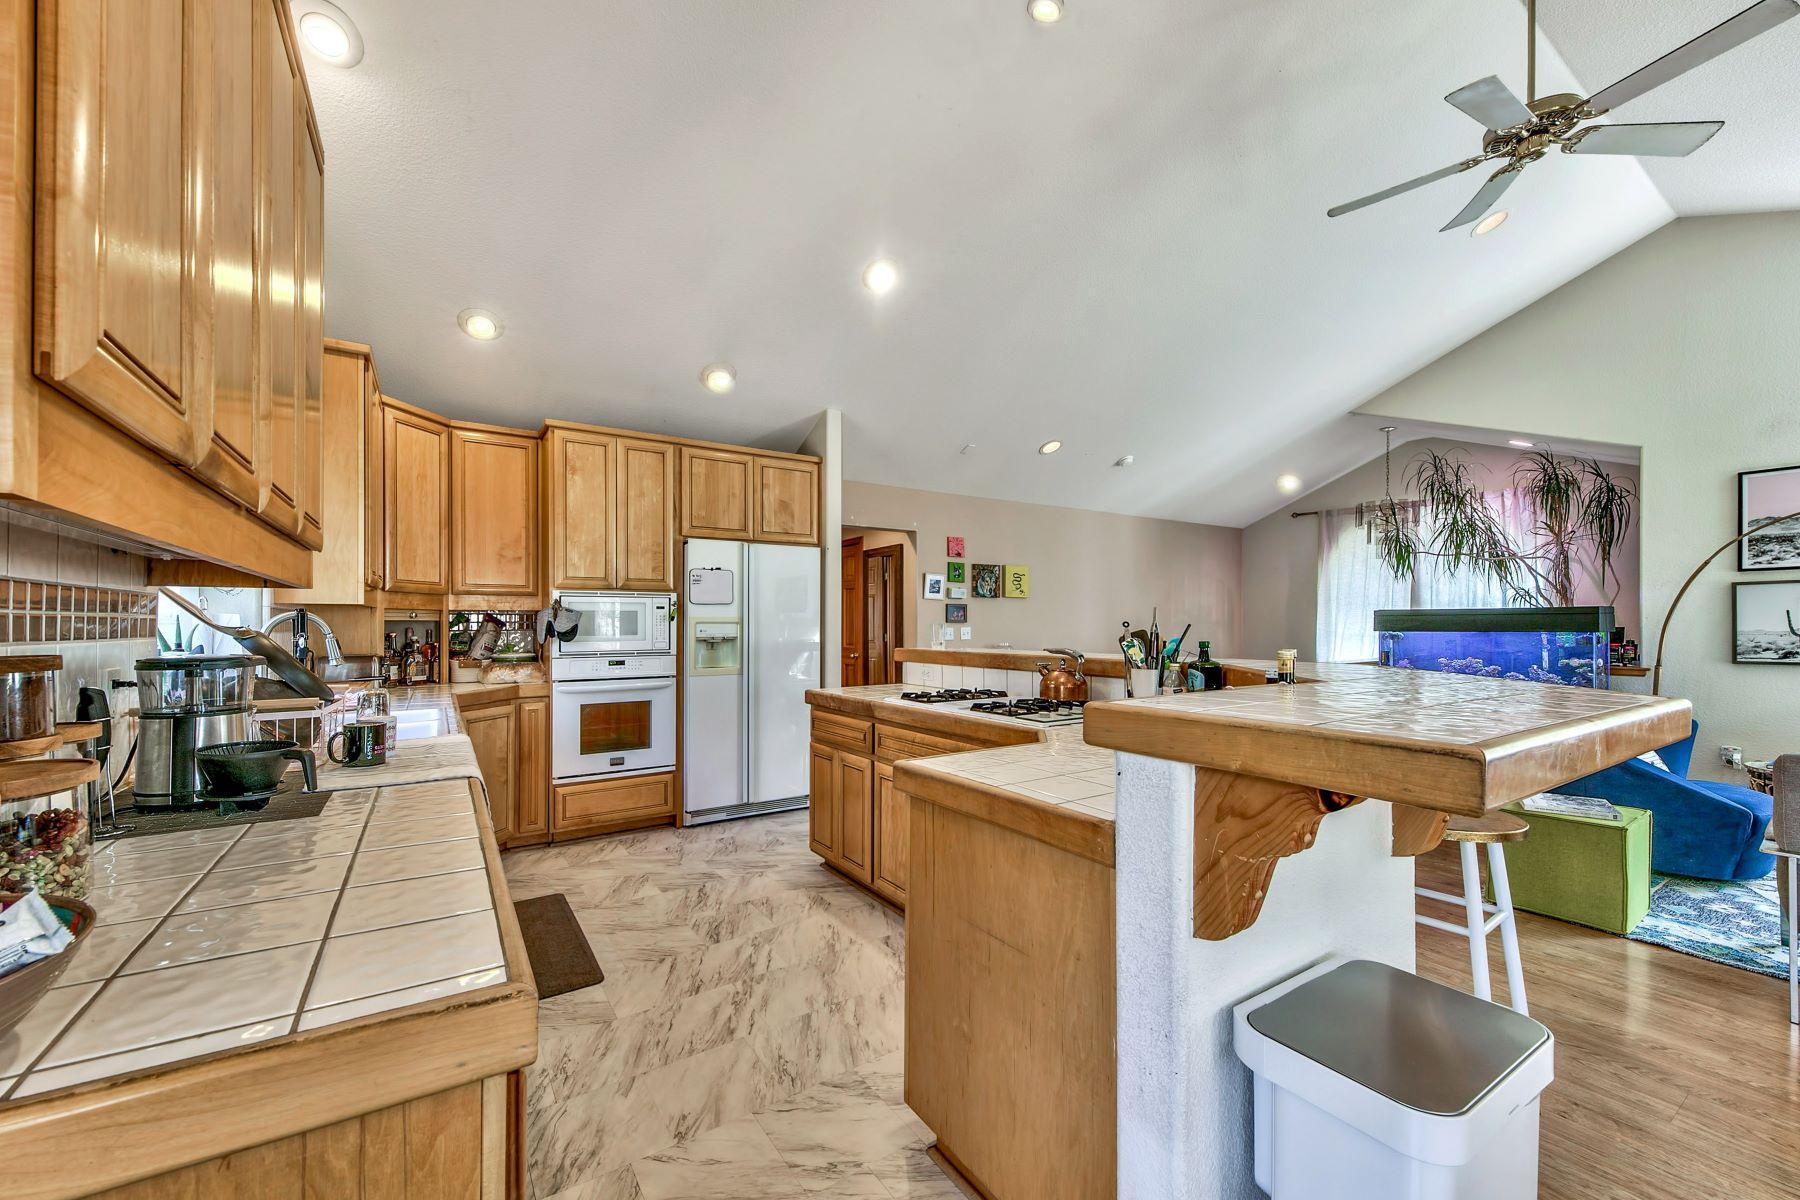 Additional photo for property listing at Kokanee Estates Mountain Home 3067 Kokanee Trail South Lake Tahoe, California 96150 United States